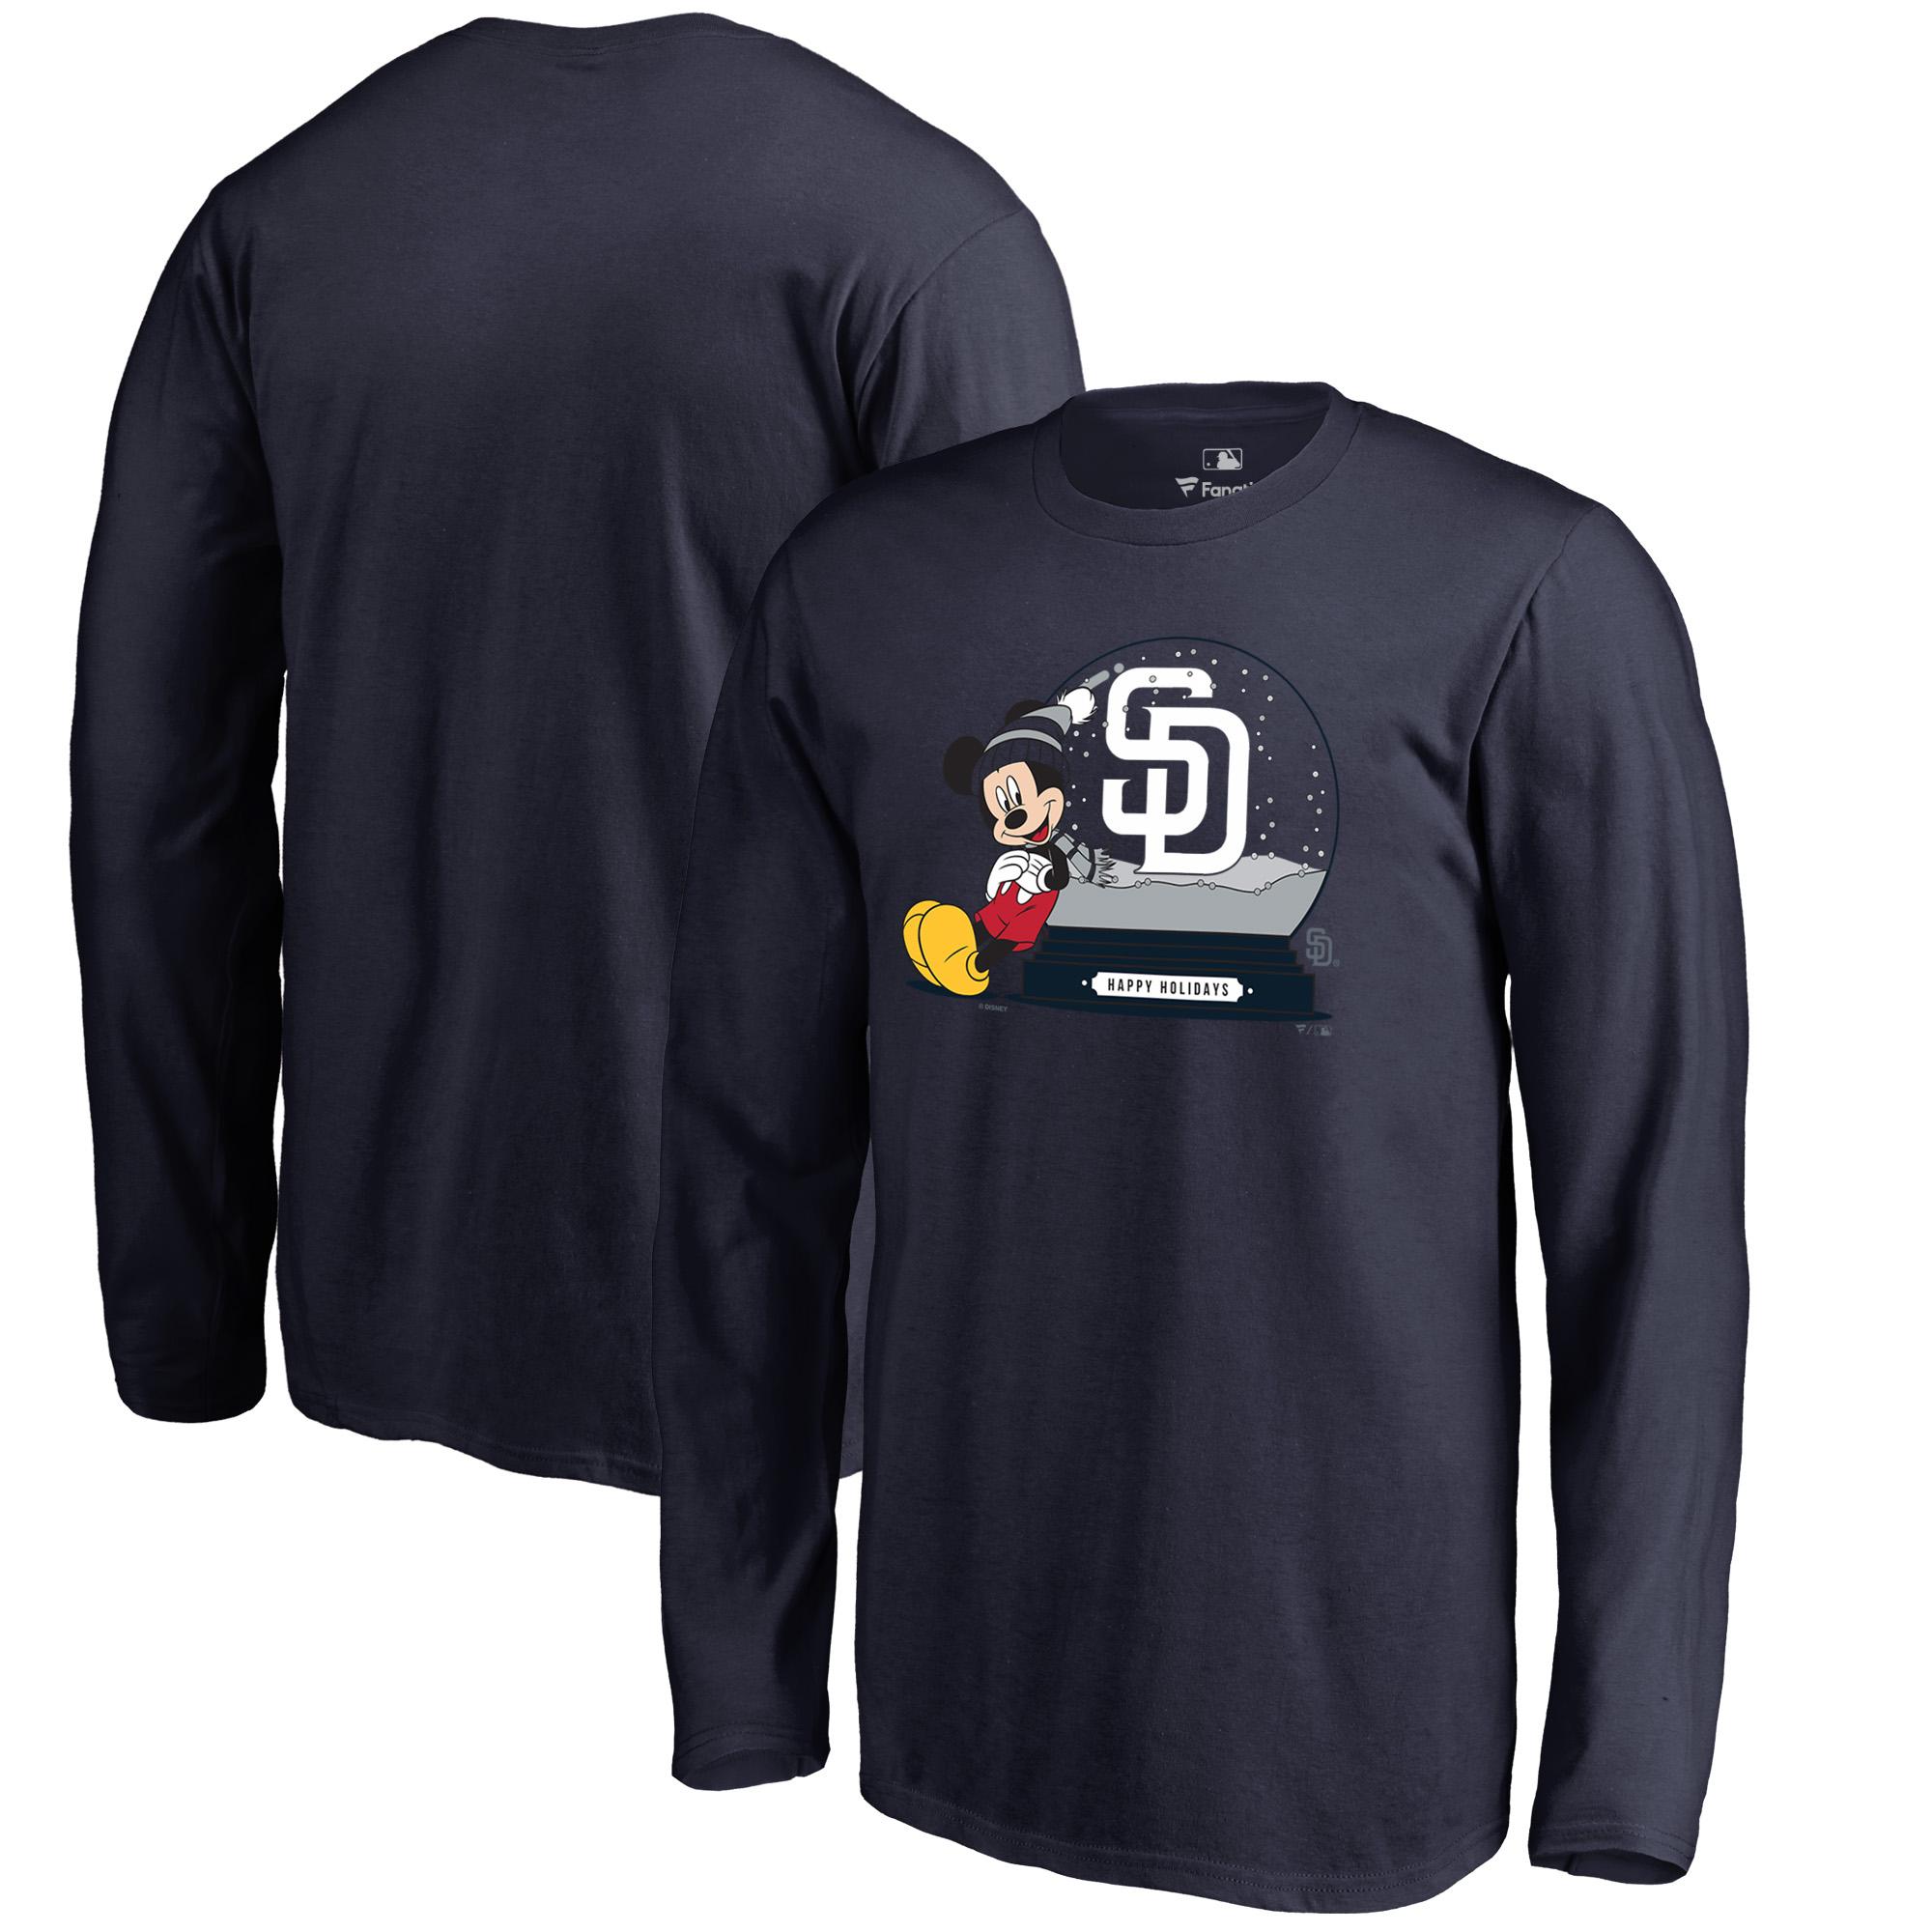 San Diego Padres Fanatics Branded Youth Disney Snow Globe Long Sleeve T-Shirt - Navy